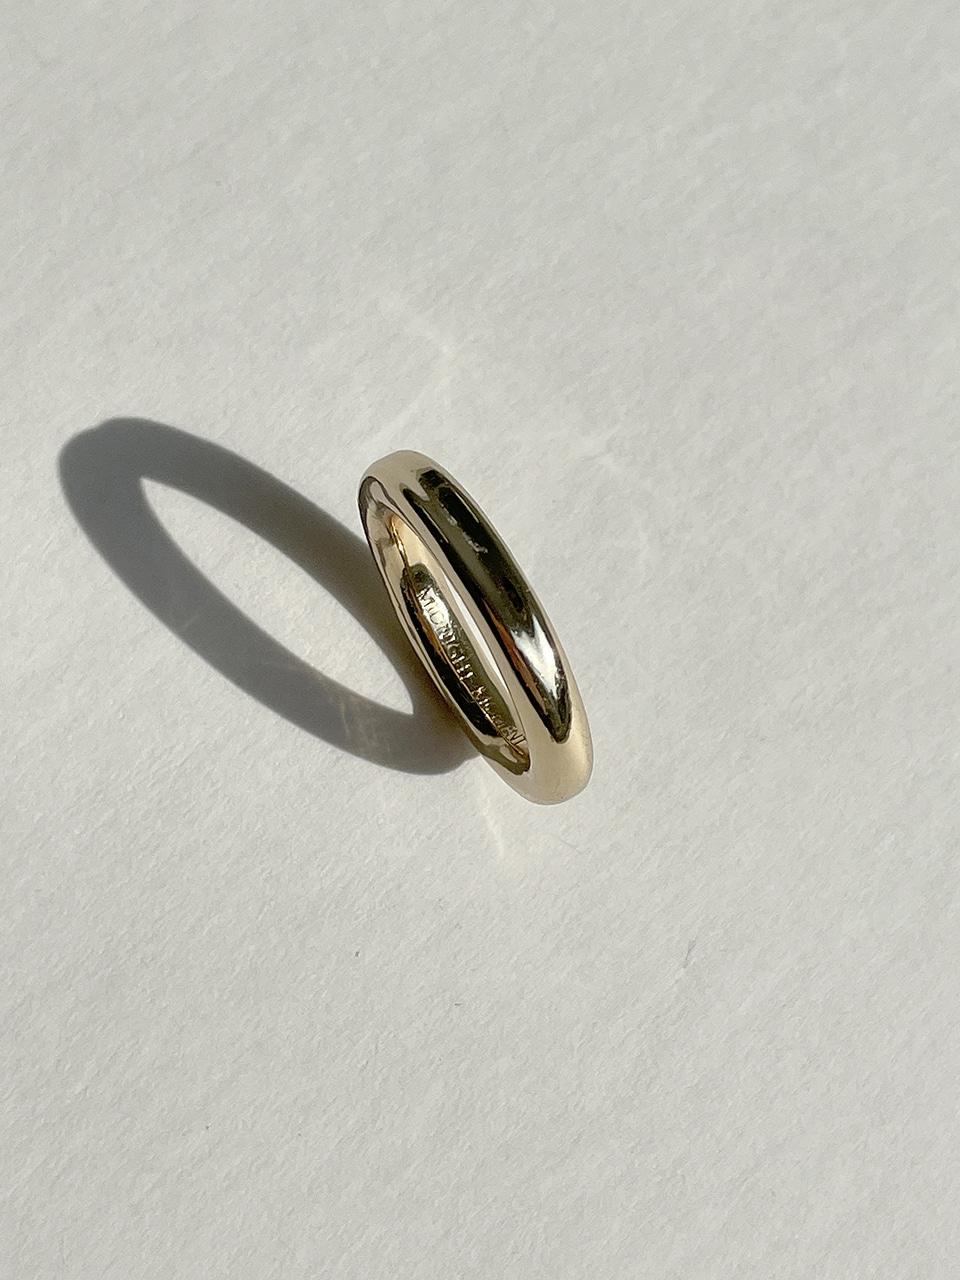 bring ring - gold